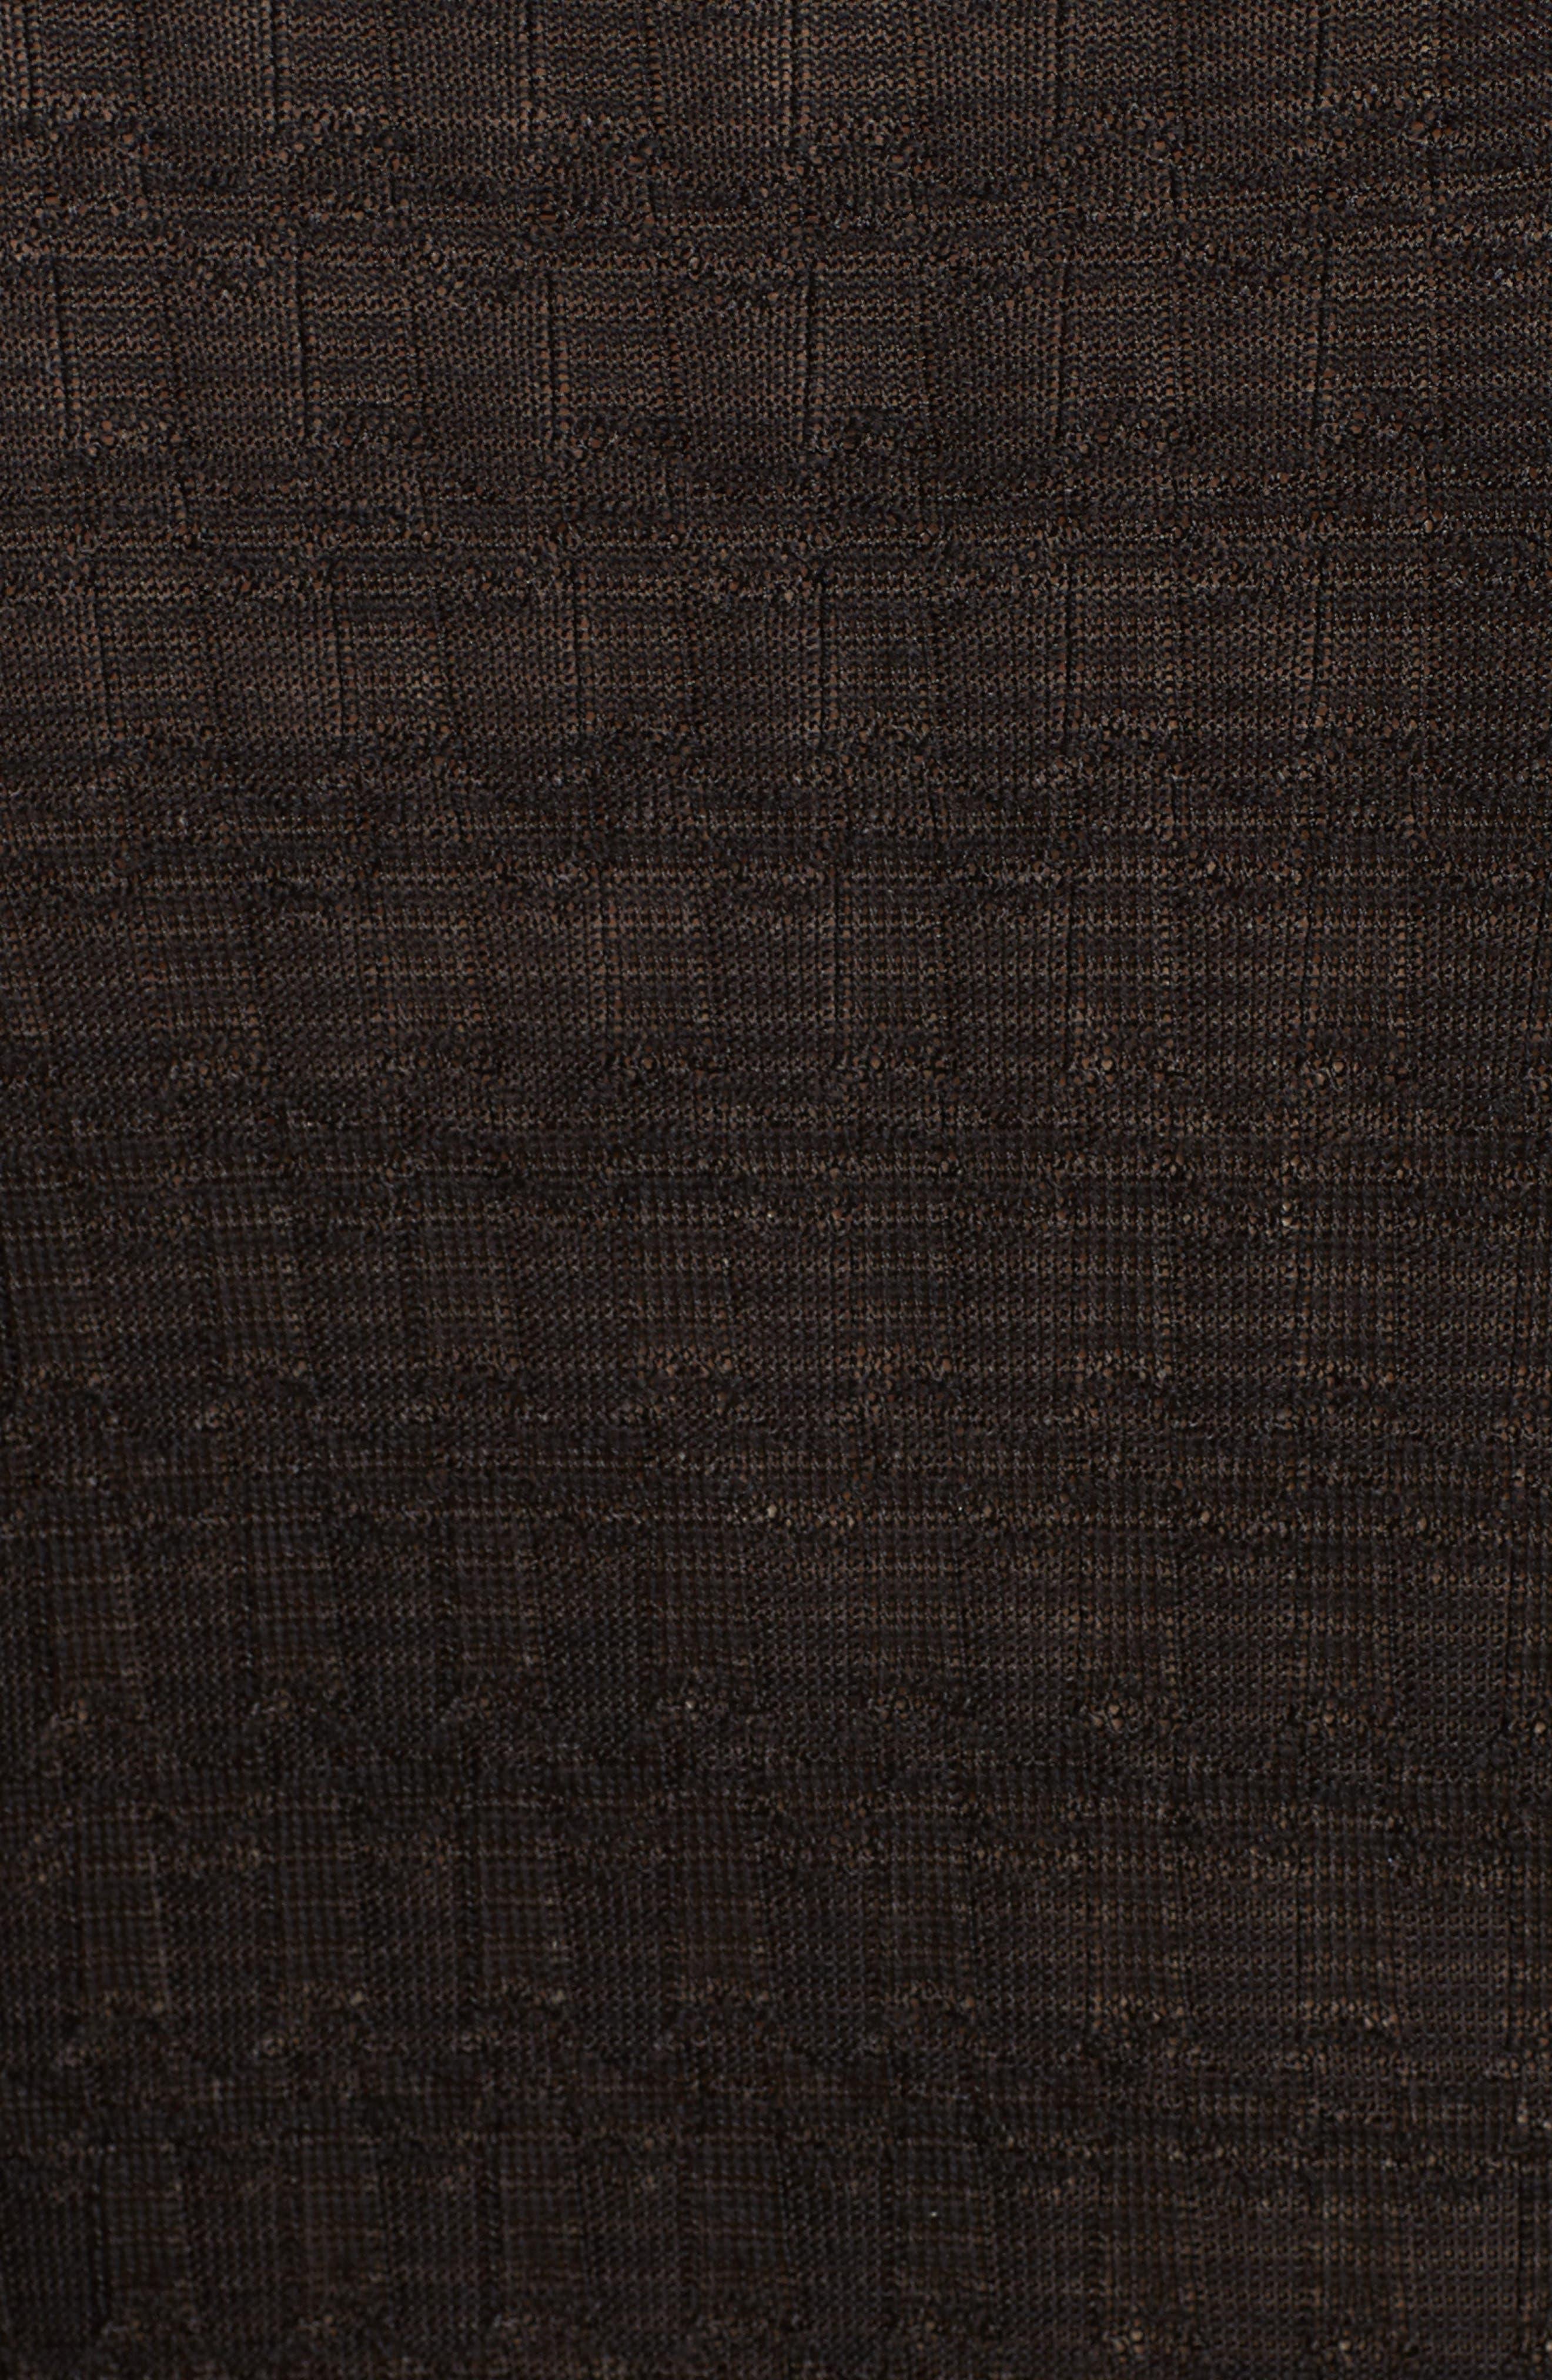 Wool Blend Empire Waist Dress,                             Alternate thumbnail 5, color,                             Black